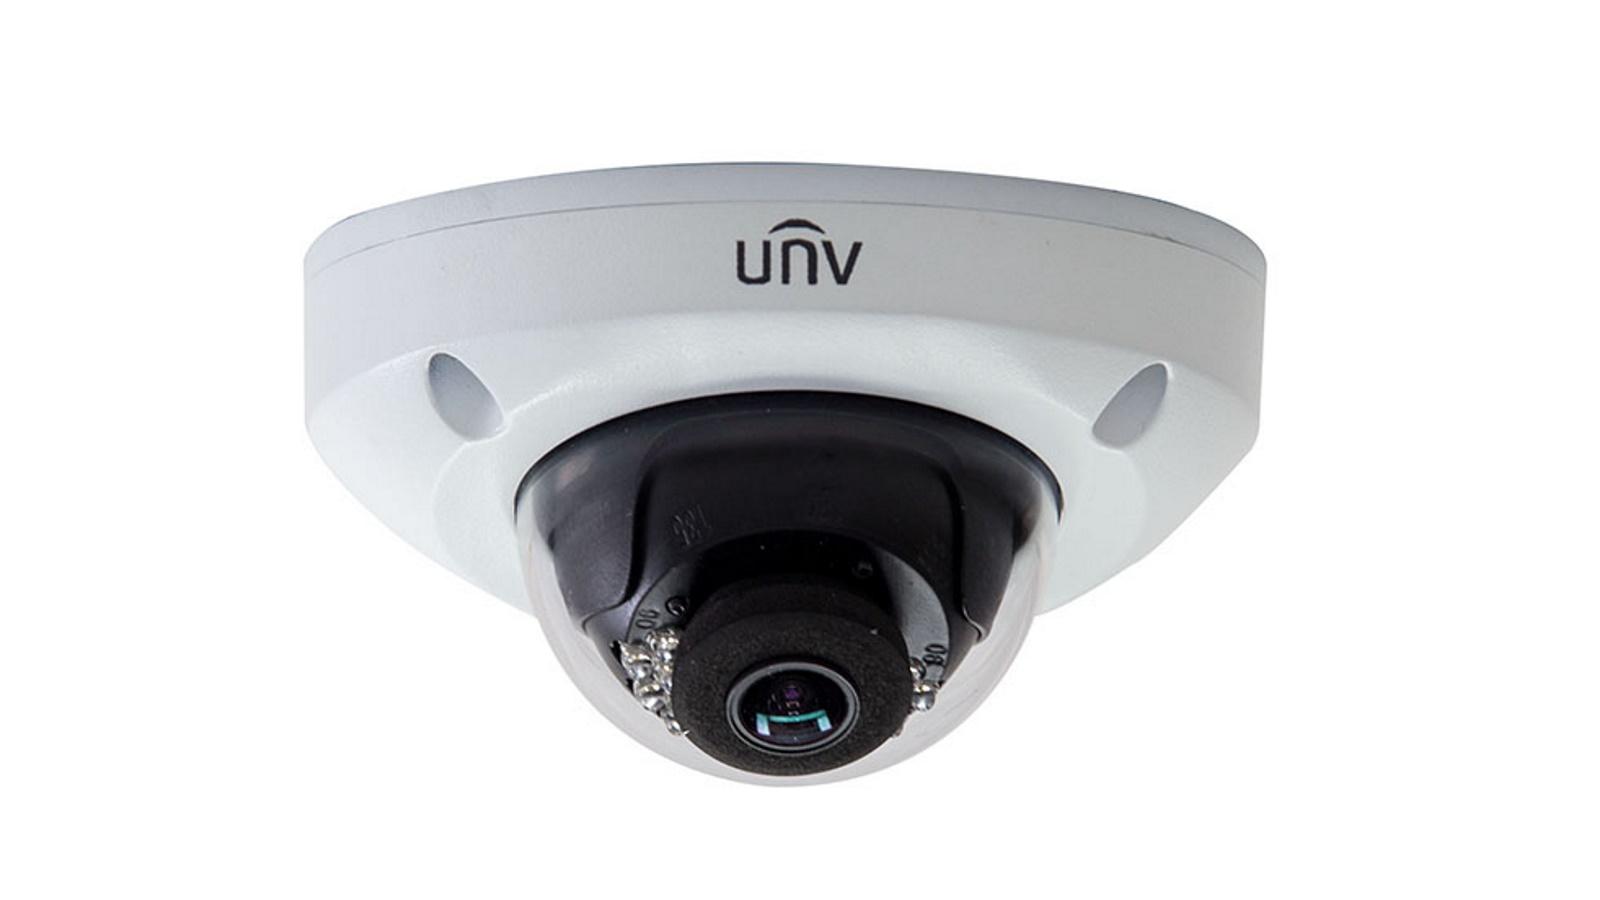 Uniview IPC314SR-DVPF28 security camera IP security camera Dome Ceiling 2592 x 1520 pixels